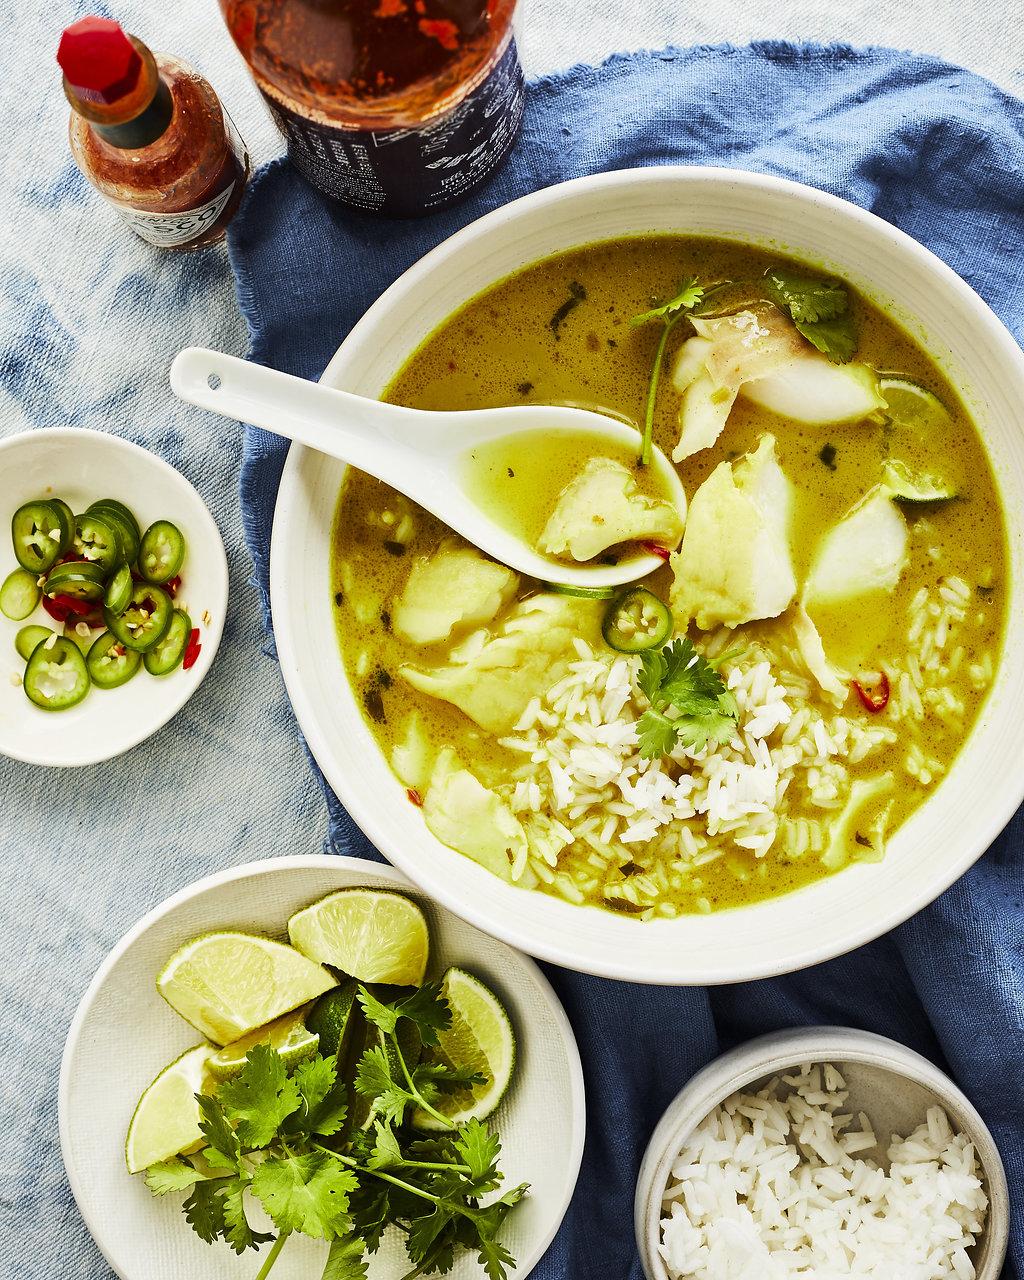 danielraiche_cuisinefutee_mag04_soupes_4